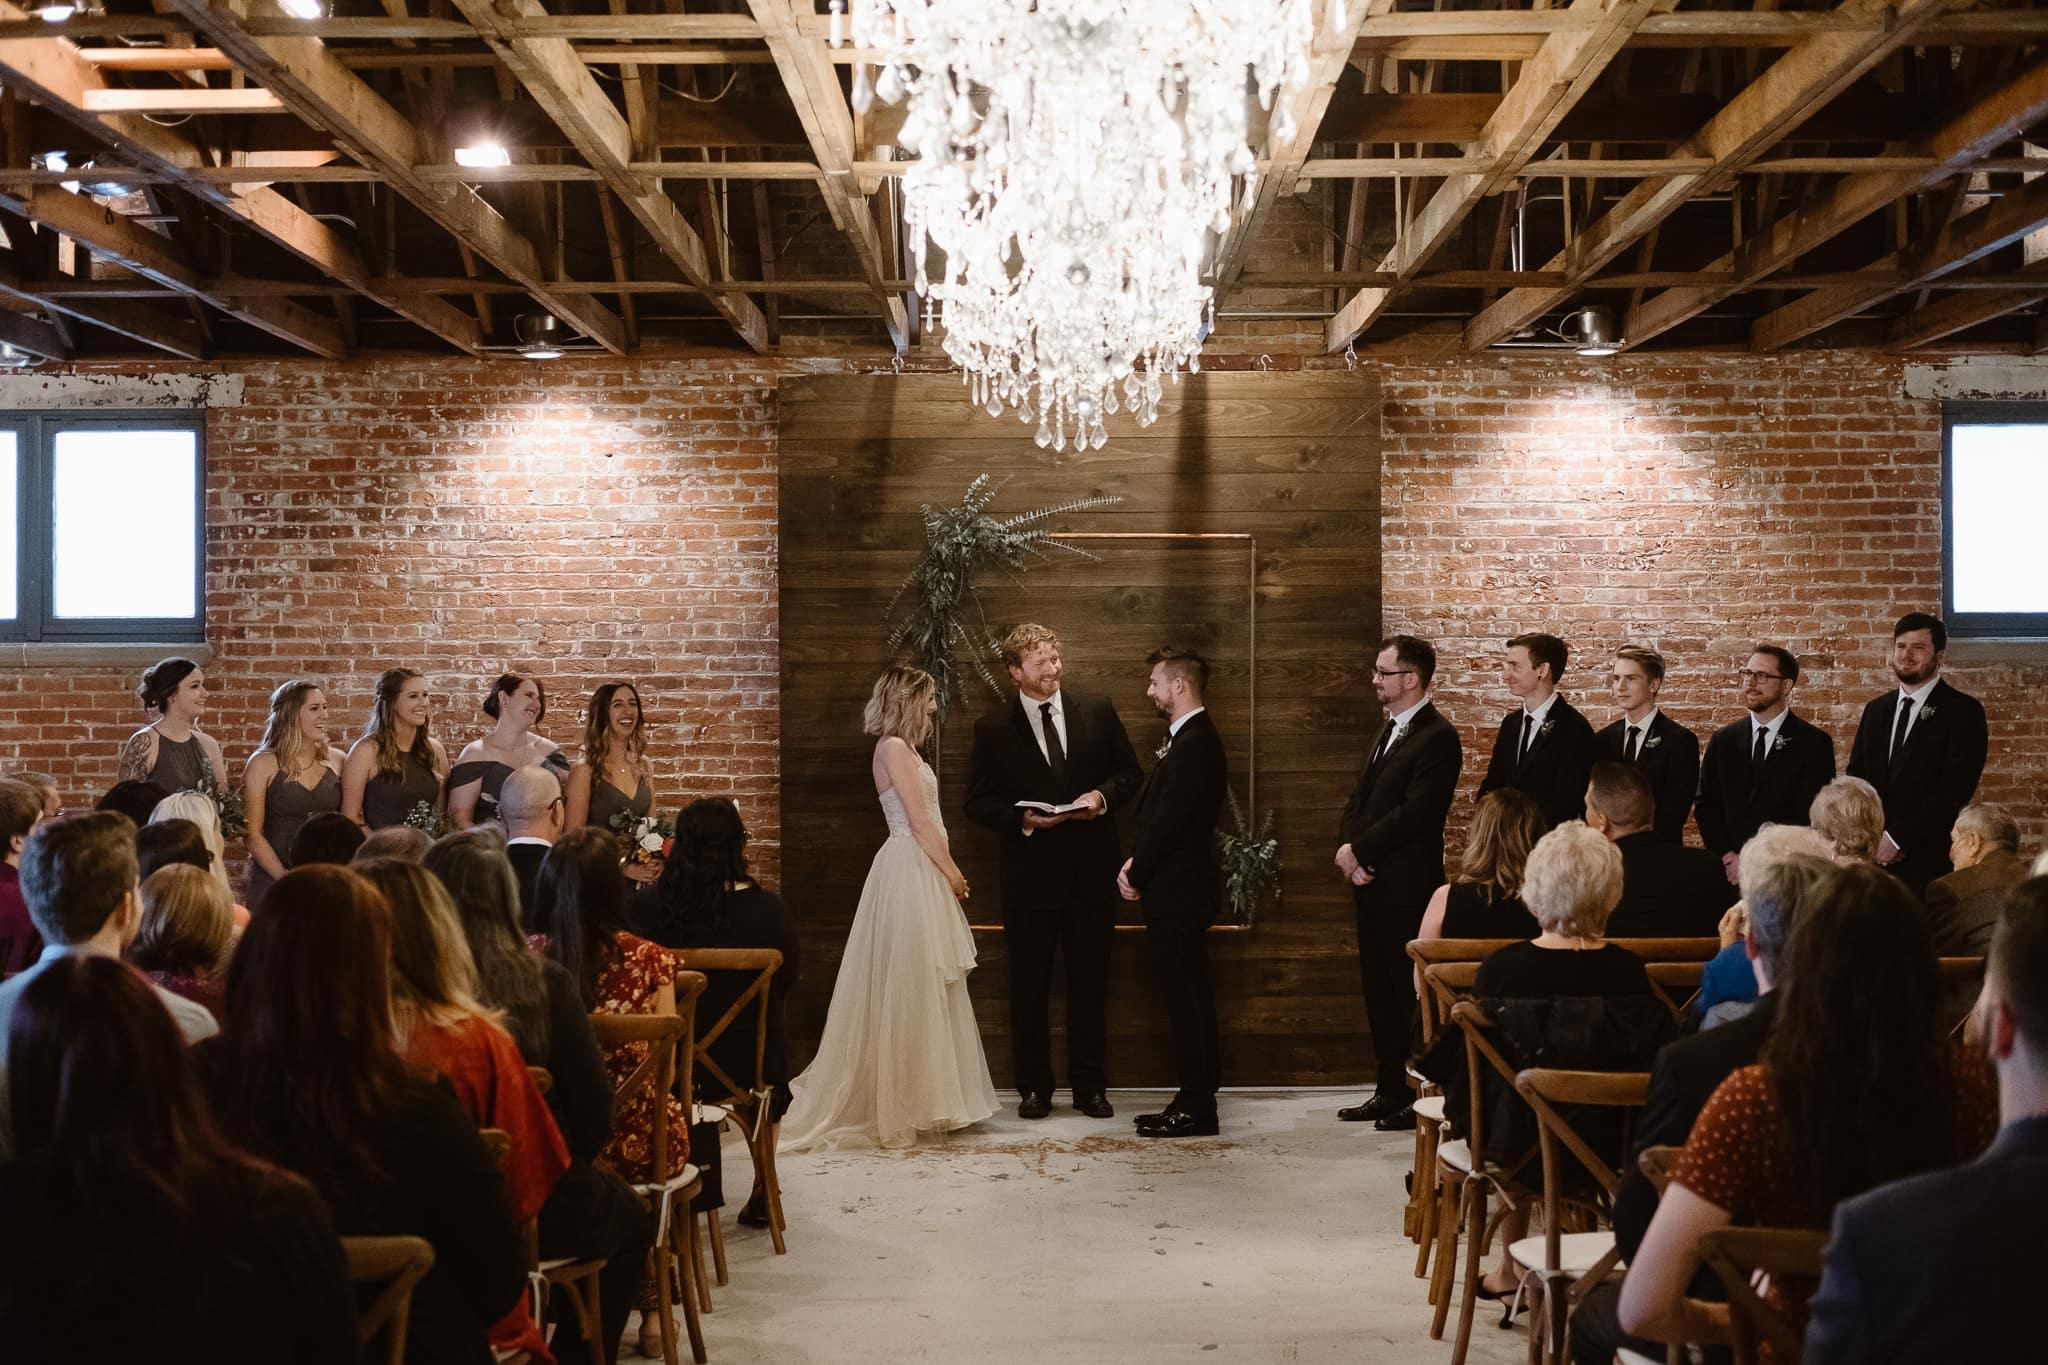 St Vrain Wedding Photographer   Longmont Wedding Photographer   Colorado Winter Wedding Photographer, Colorado industrial chic wedding ceremony,